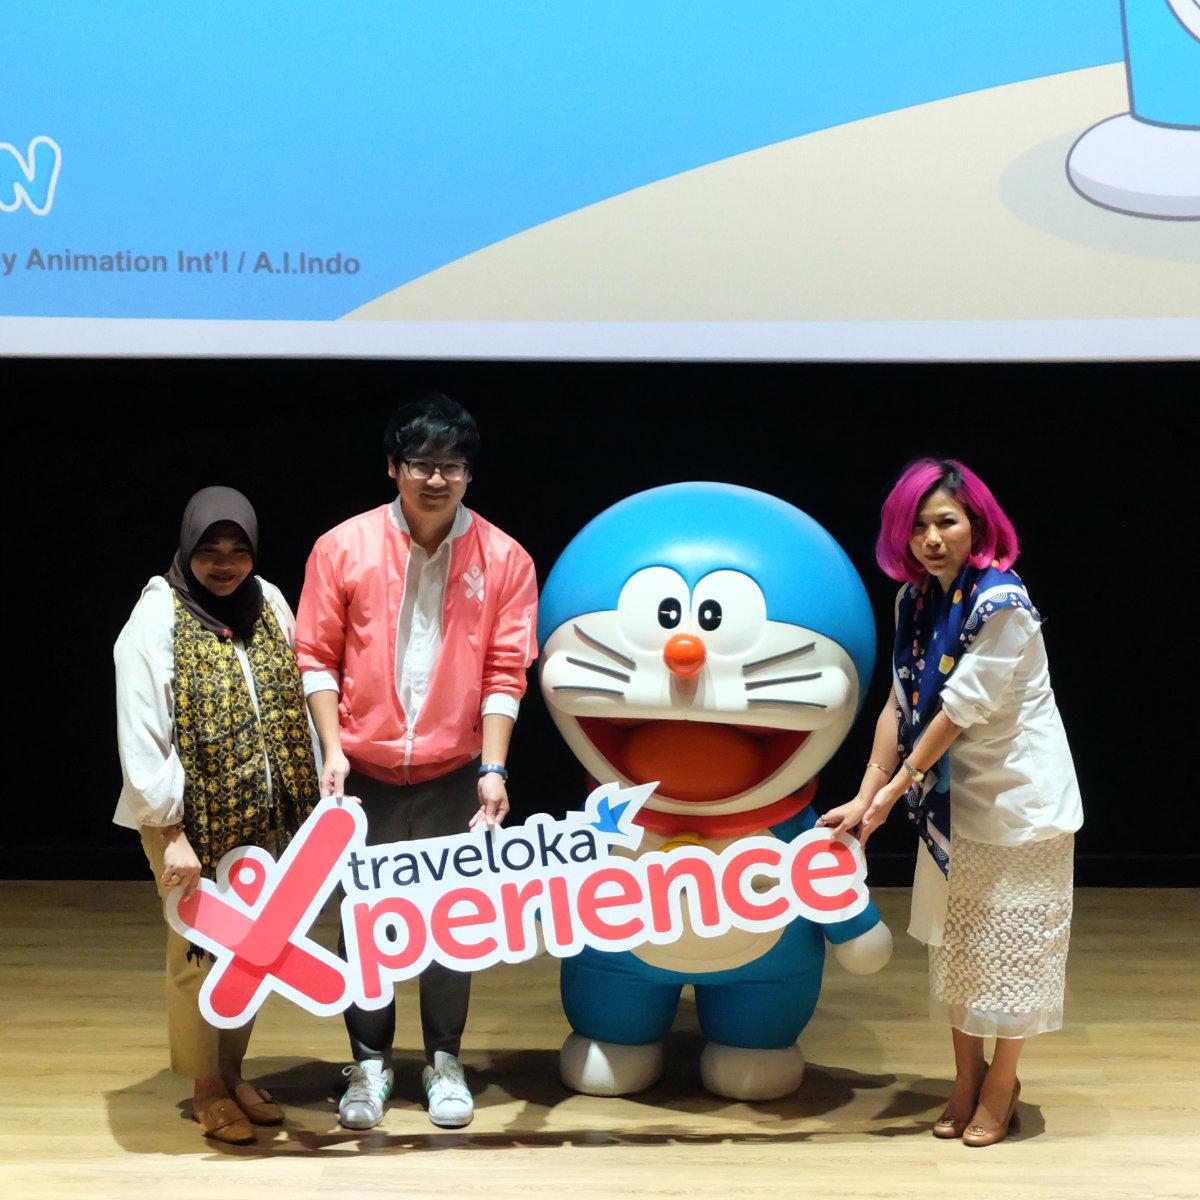 Ragam Gadget Doraemon Kini Hadir Dalam Traveloka Xperience